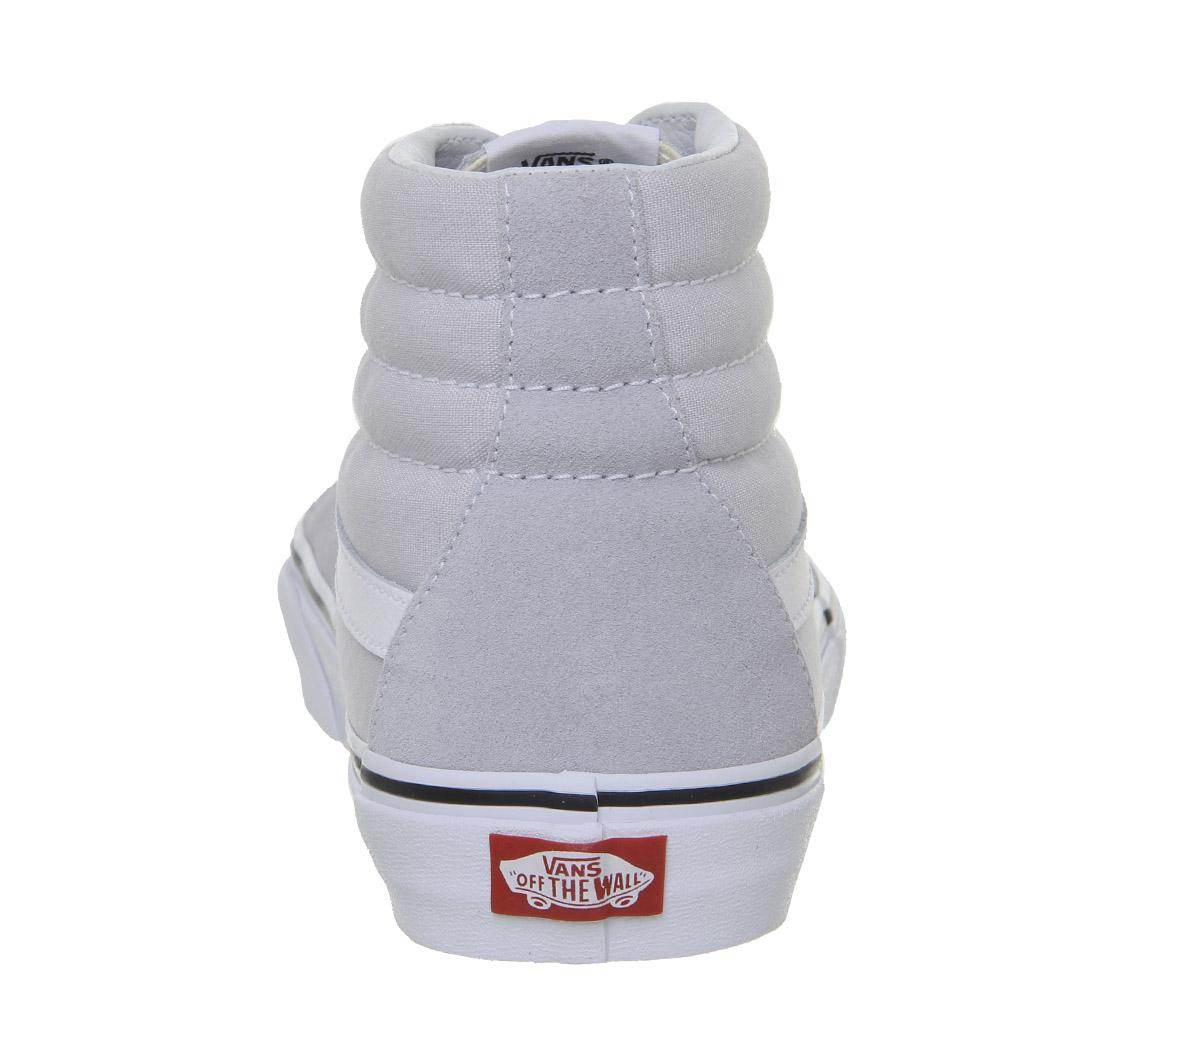 ffd298c812 Sentinel Womens Vans Sk8 Hi Trainers Gray Dawn True White Trainers Shoes